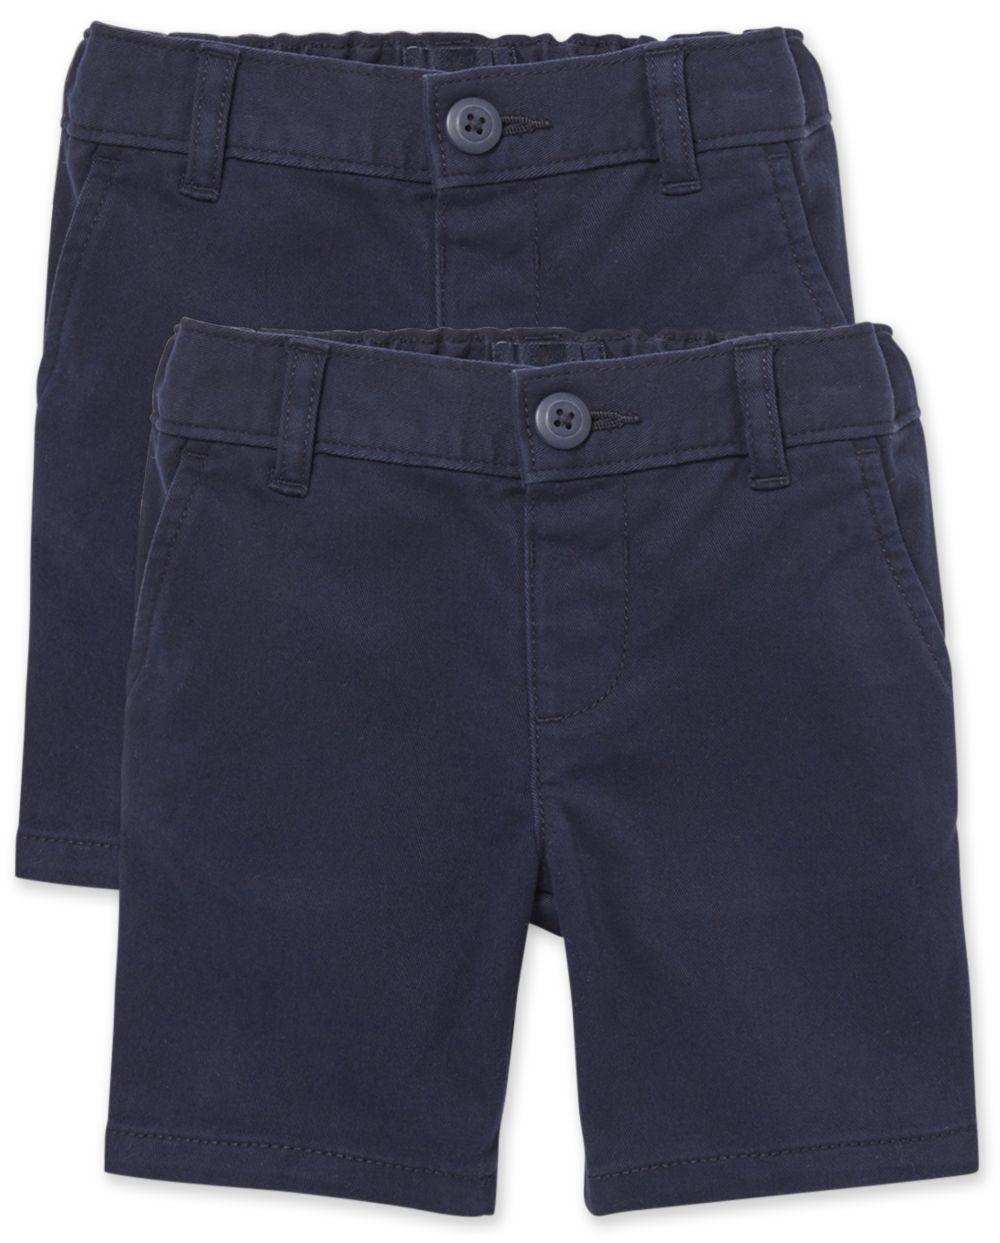 Toddler Girls Uniform Chino Shorts 2-Pack